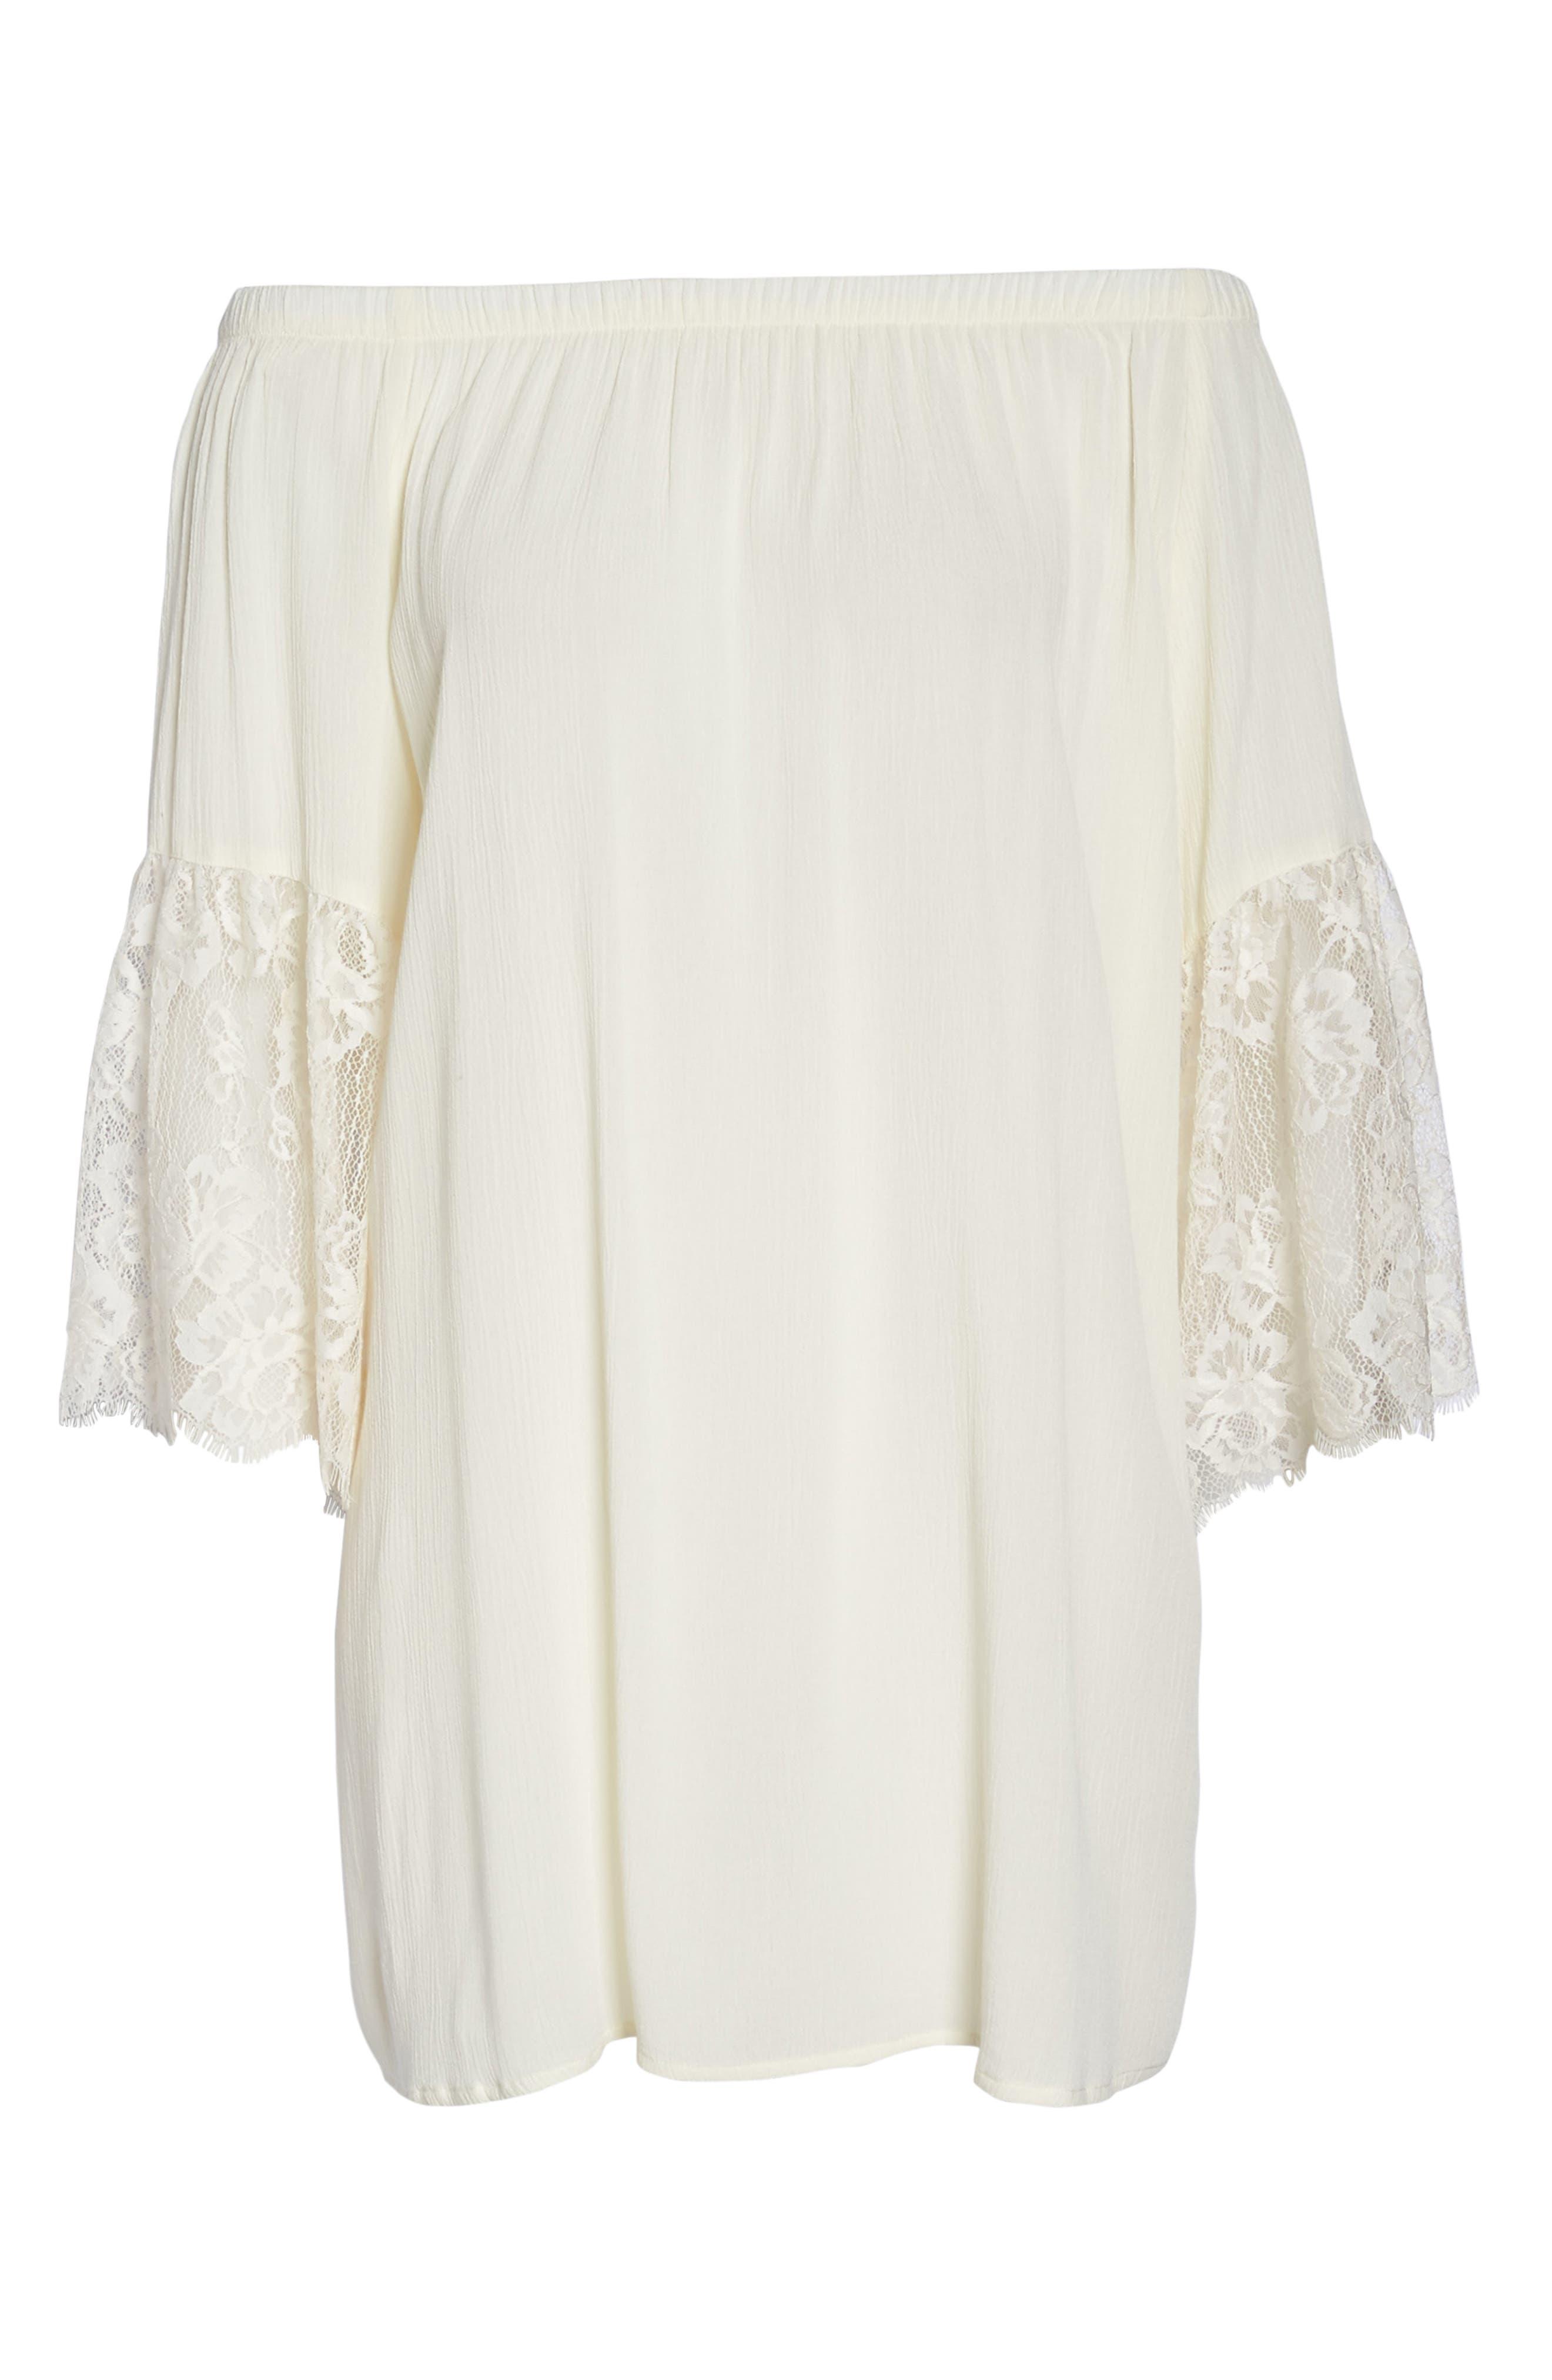 Off the Shoulder Cover-Up Dress,                             Alternate thumbnail 6, color,                             001